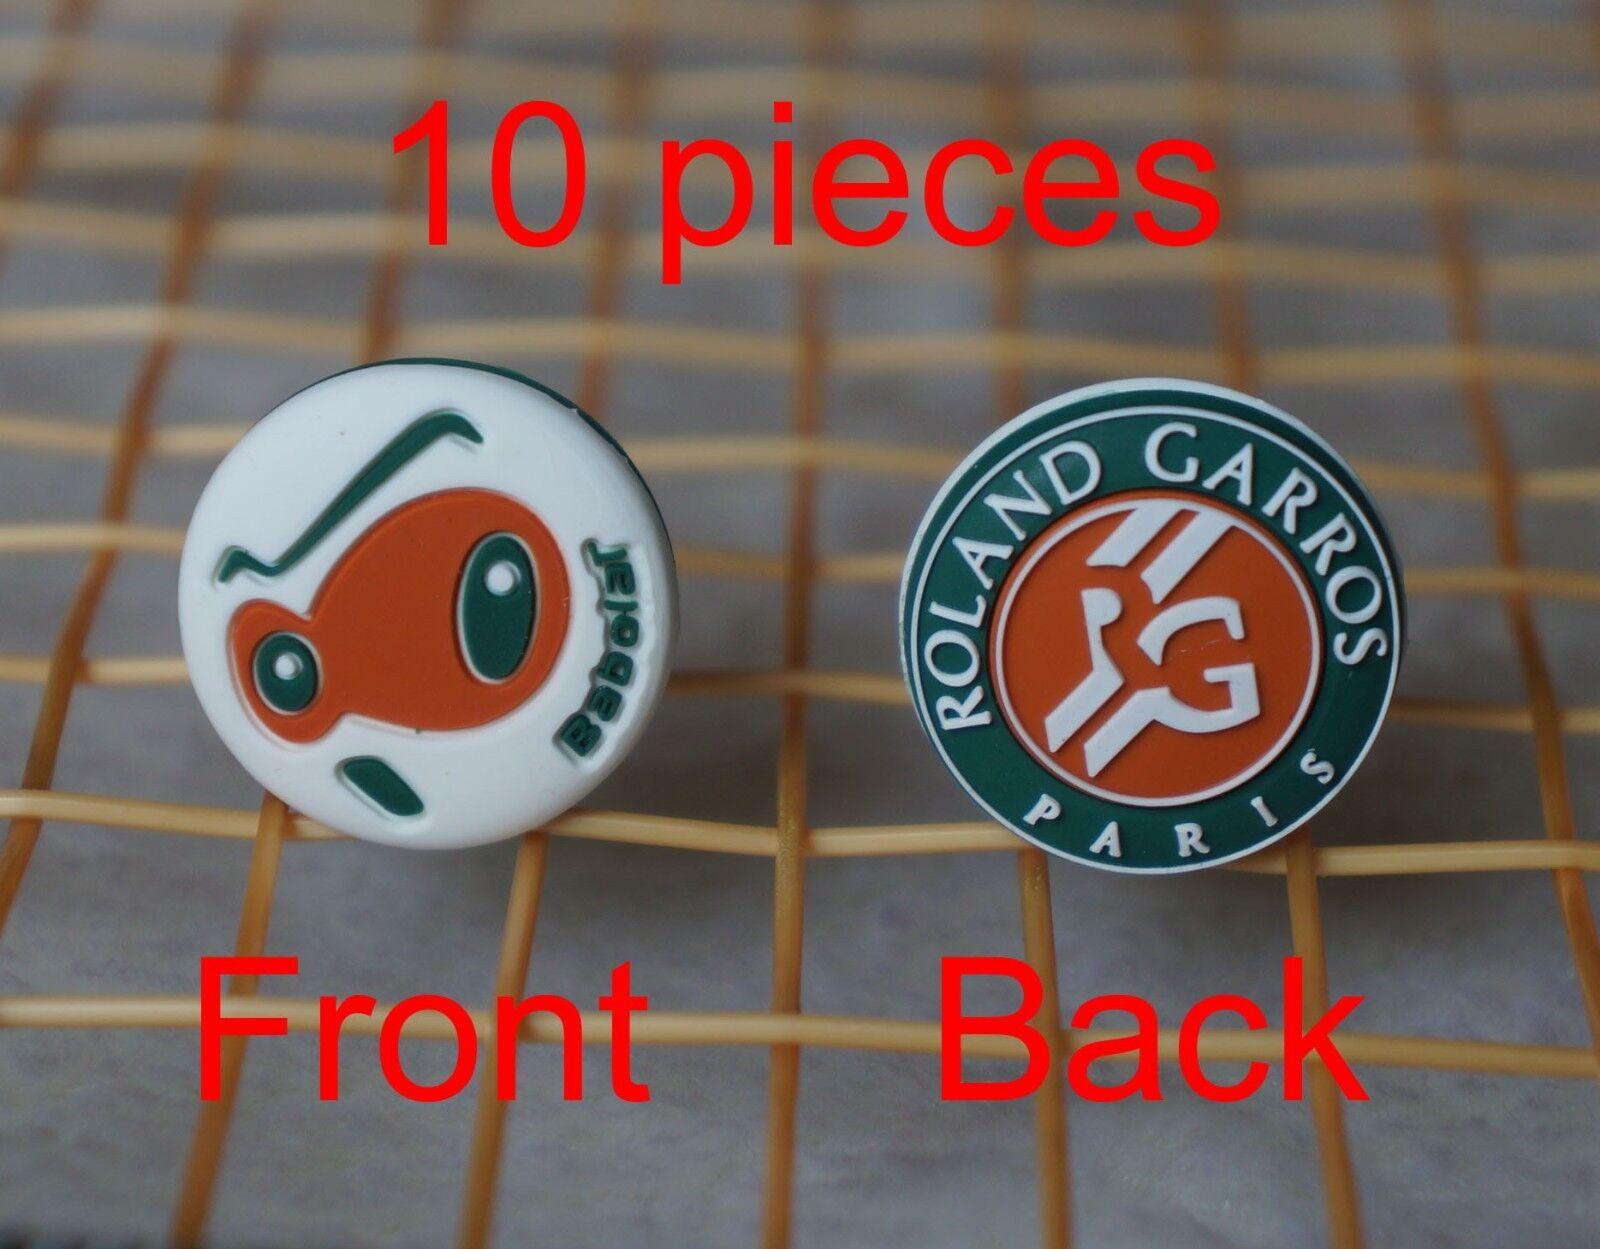 KiTki BABOLAT Roland Garros Loony Damp French Open tennis vibration dampener x10